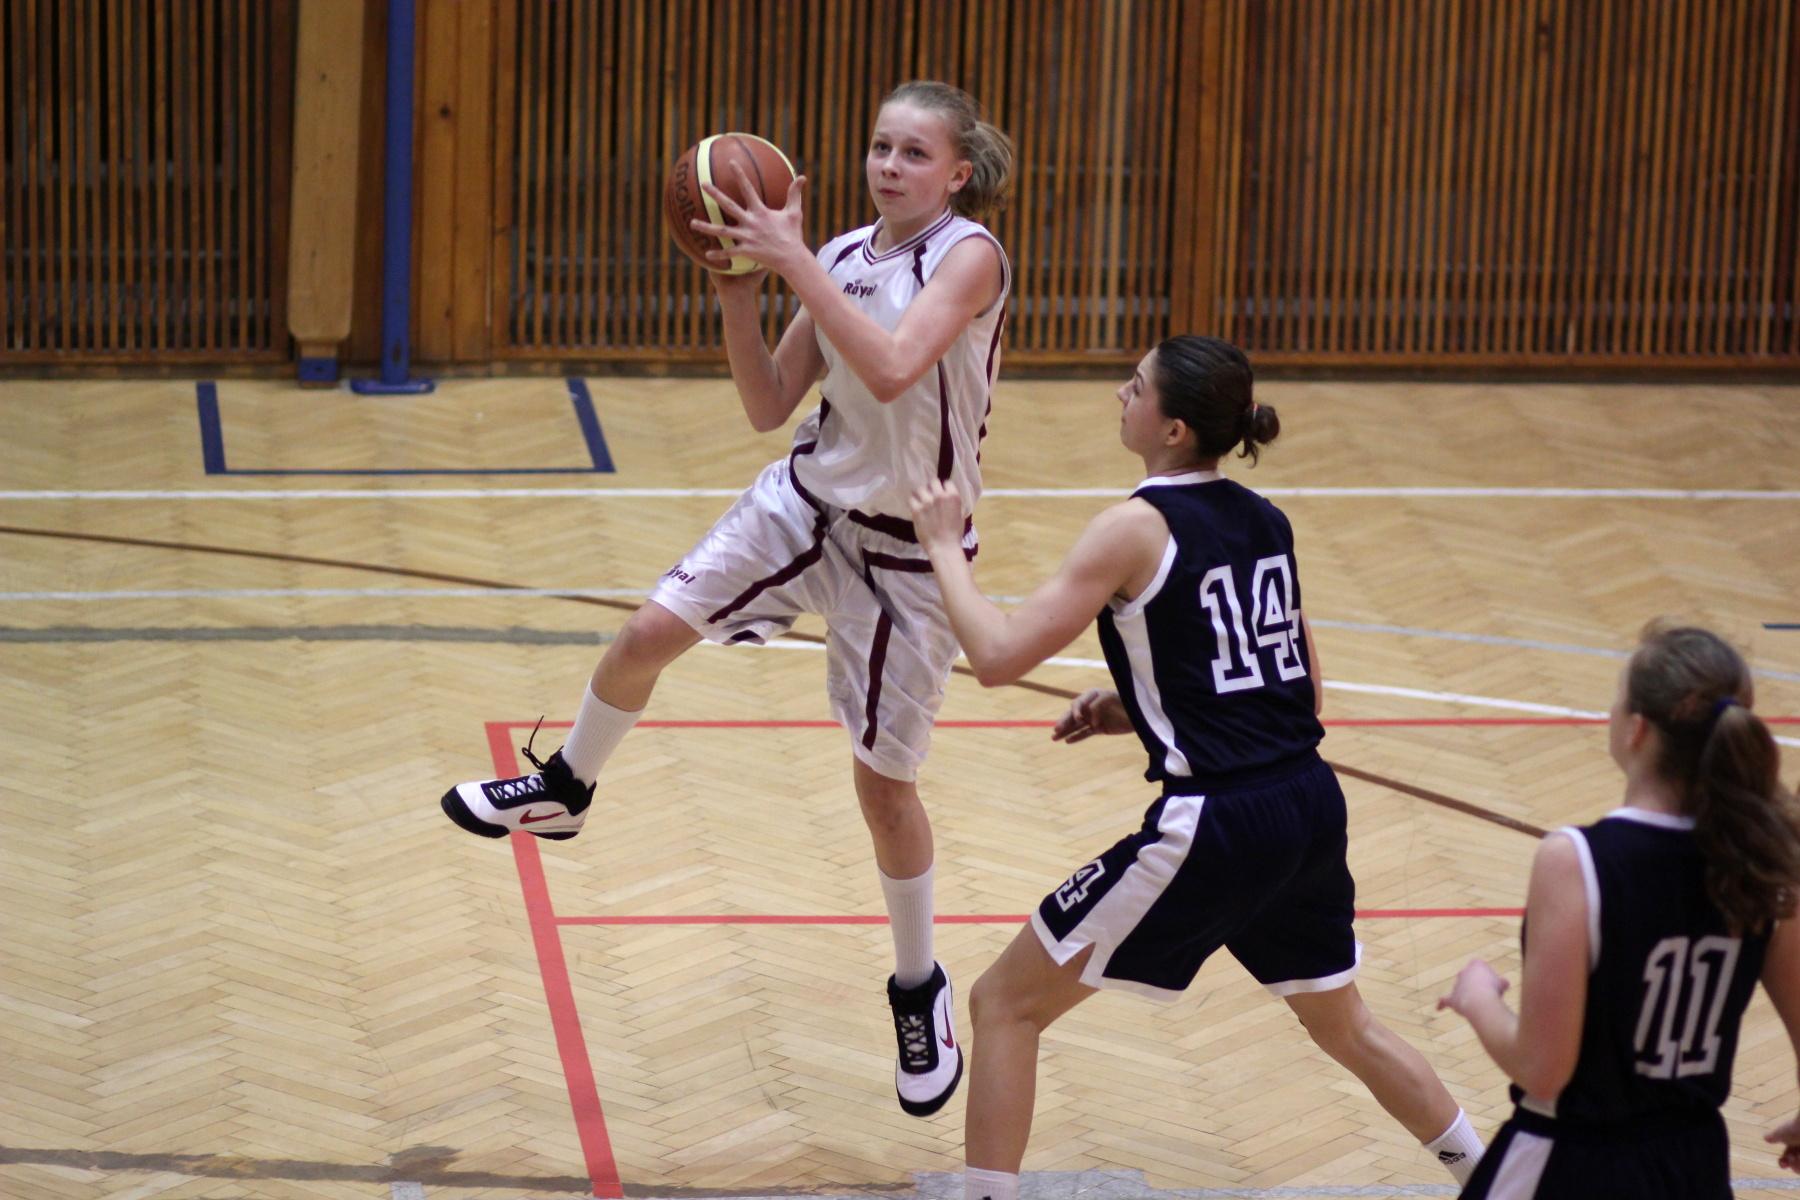 bk-zvolen-bk-petrzalka-ziacky-basketbal-17